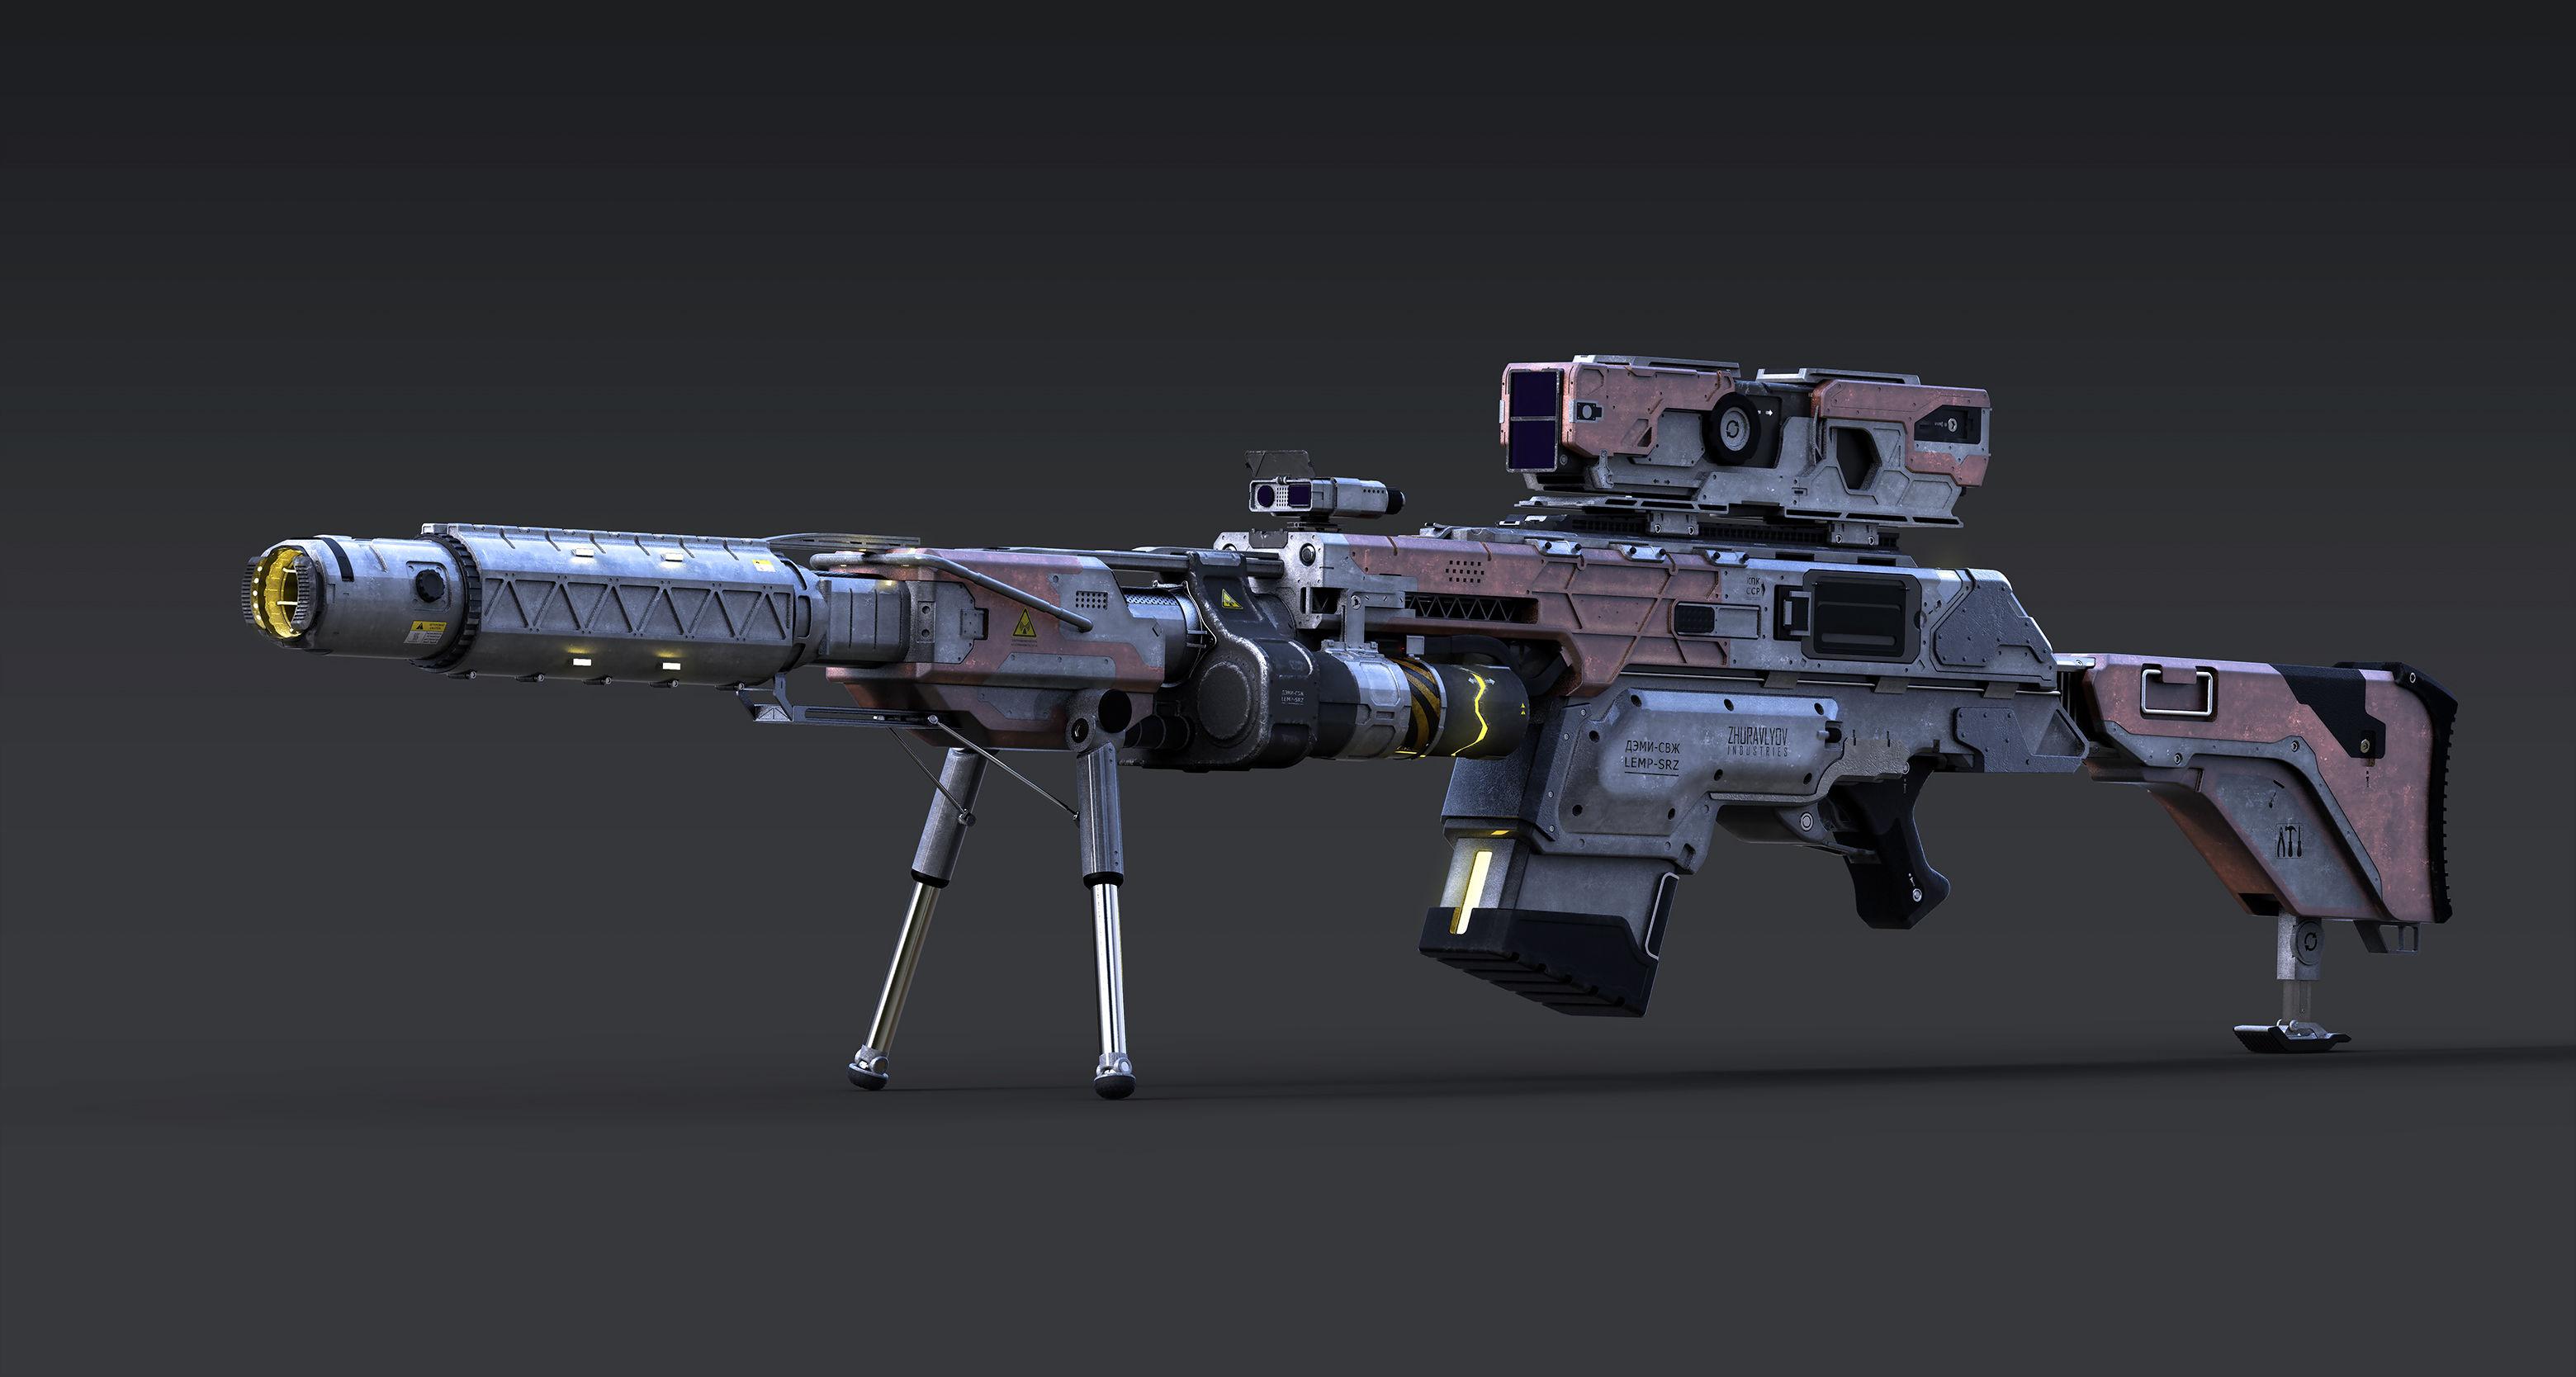 Srz-3k-3-3500-3500